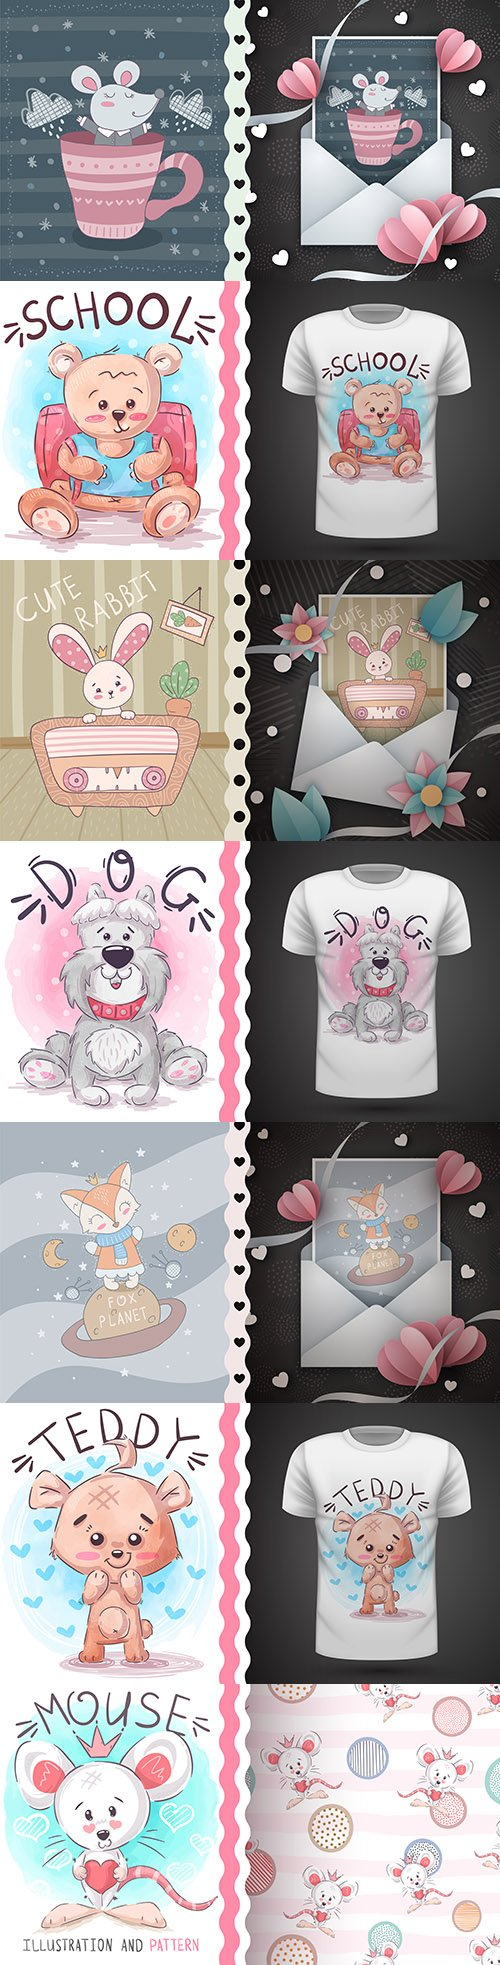 Funny animal cartoon characters design press on t-shirt 7